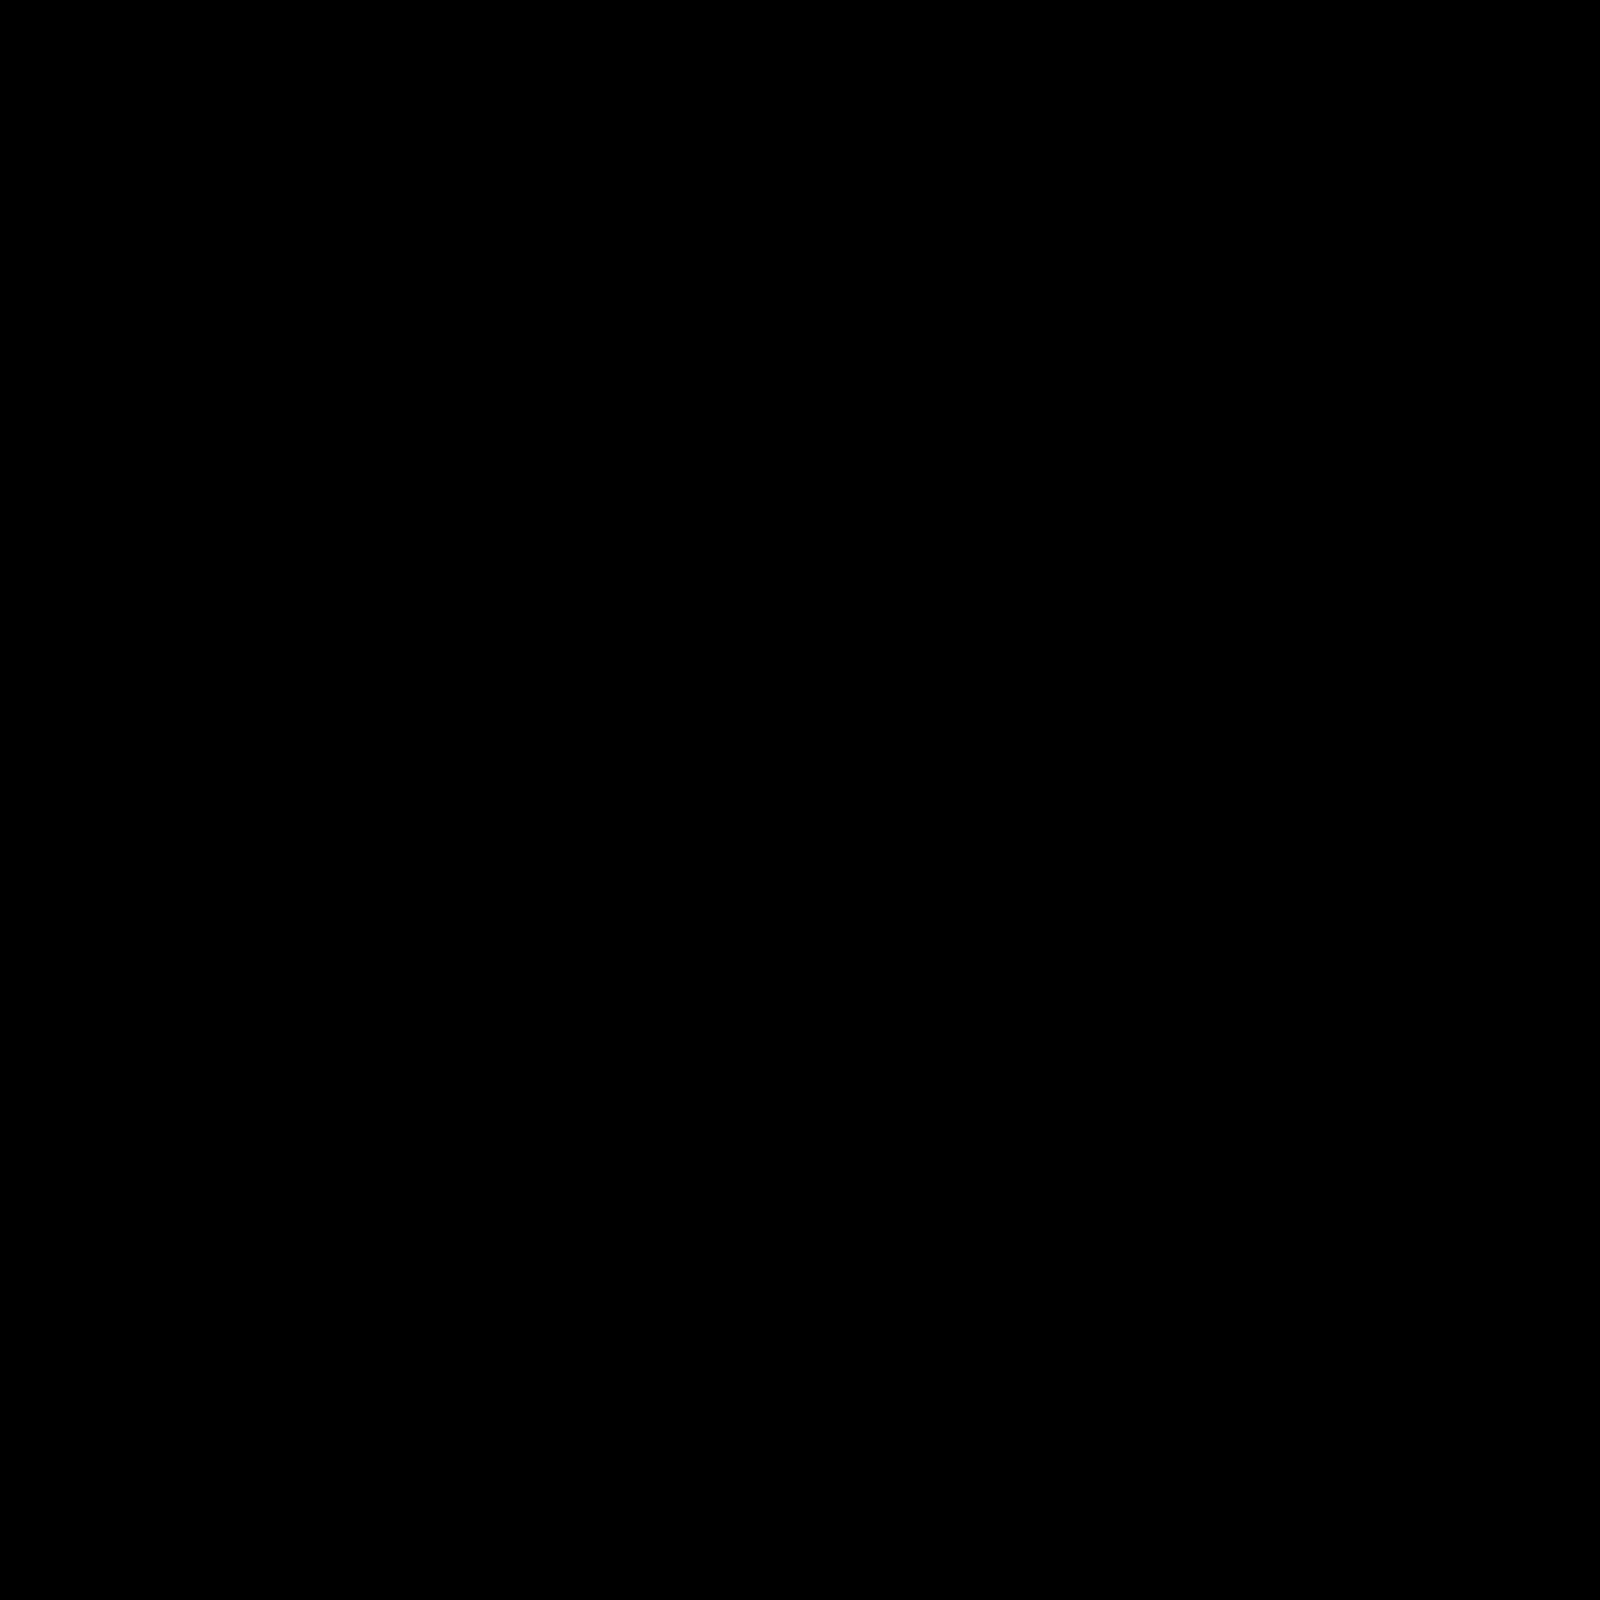 Windrose icon